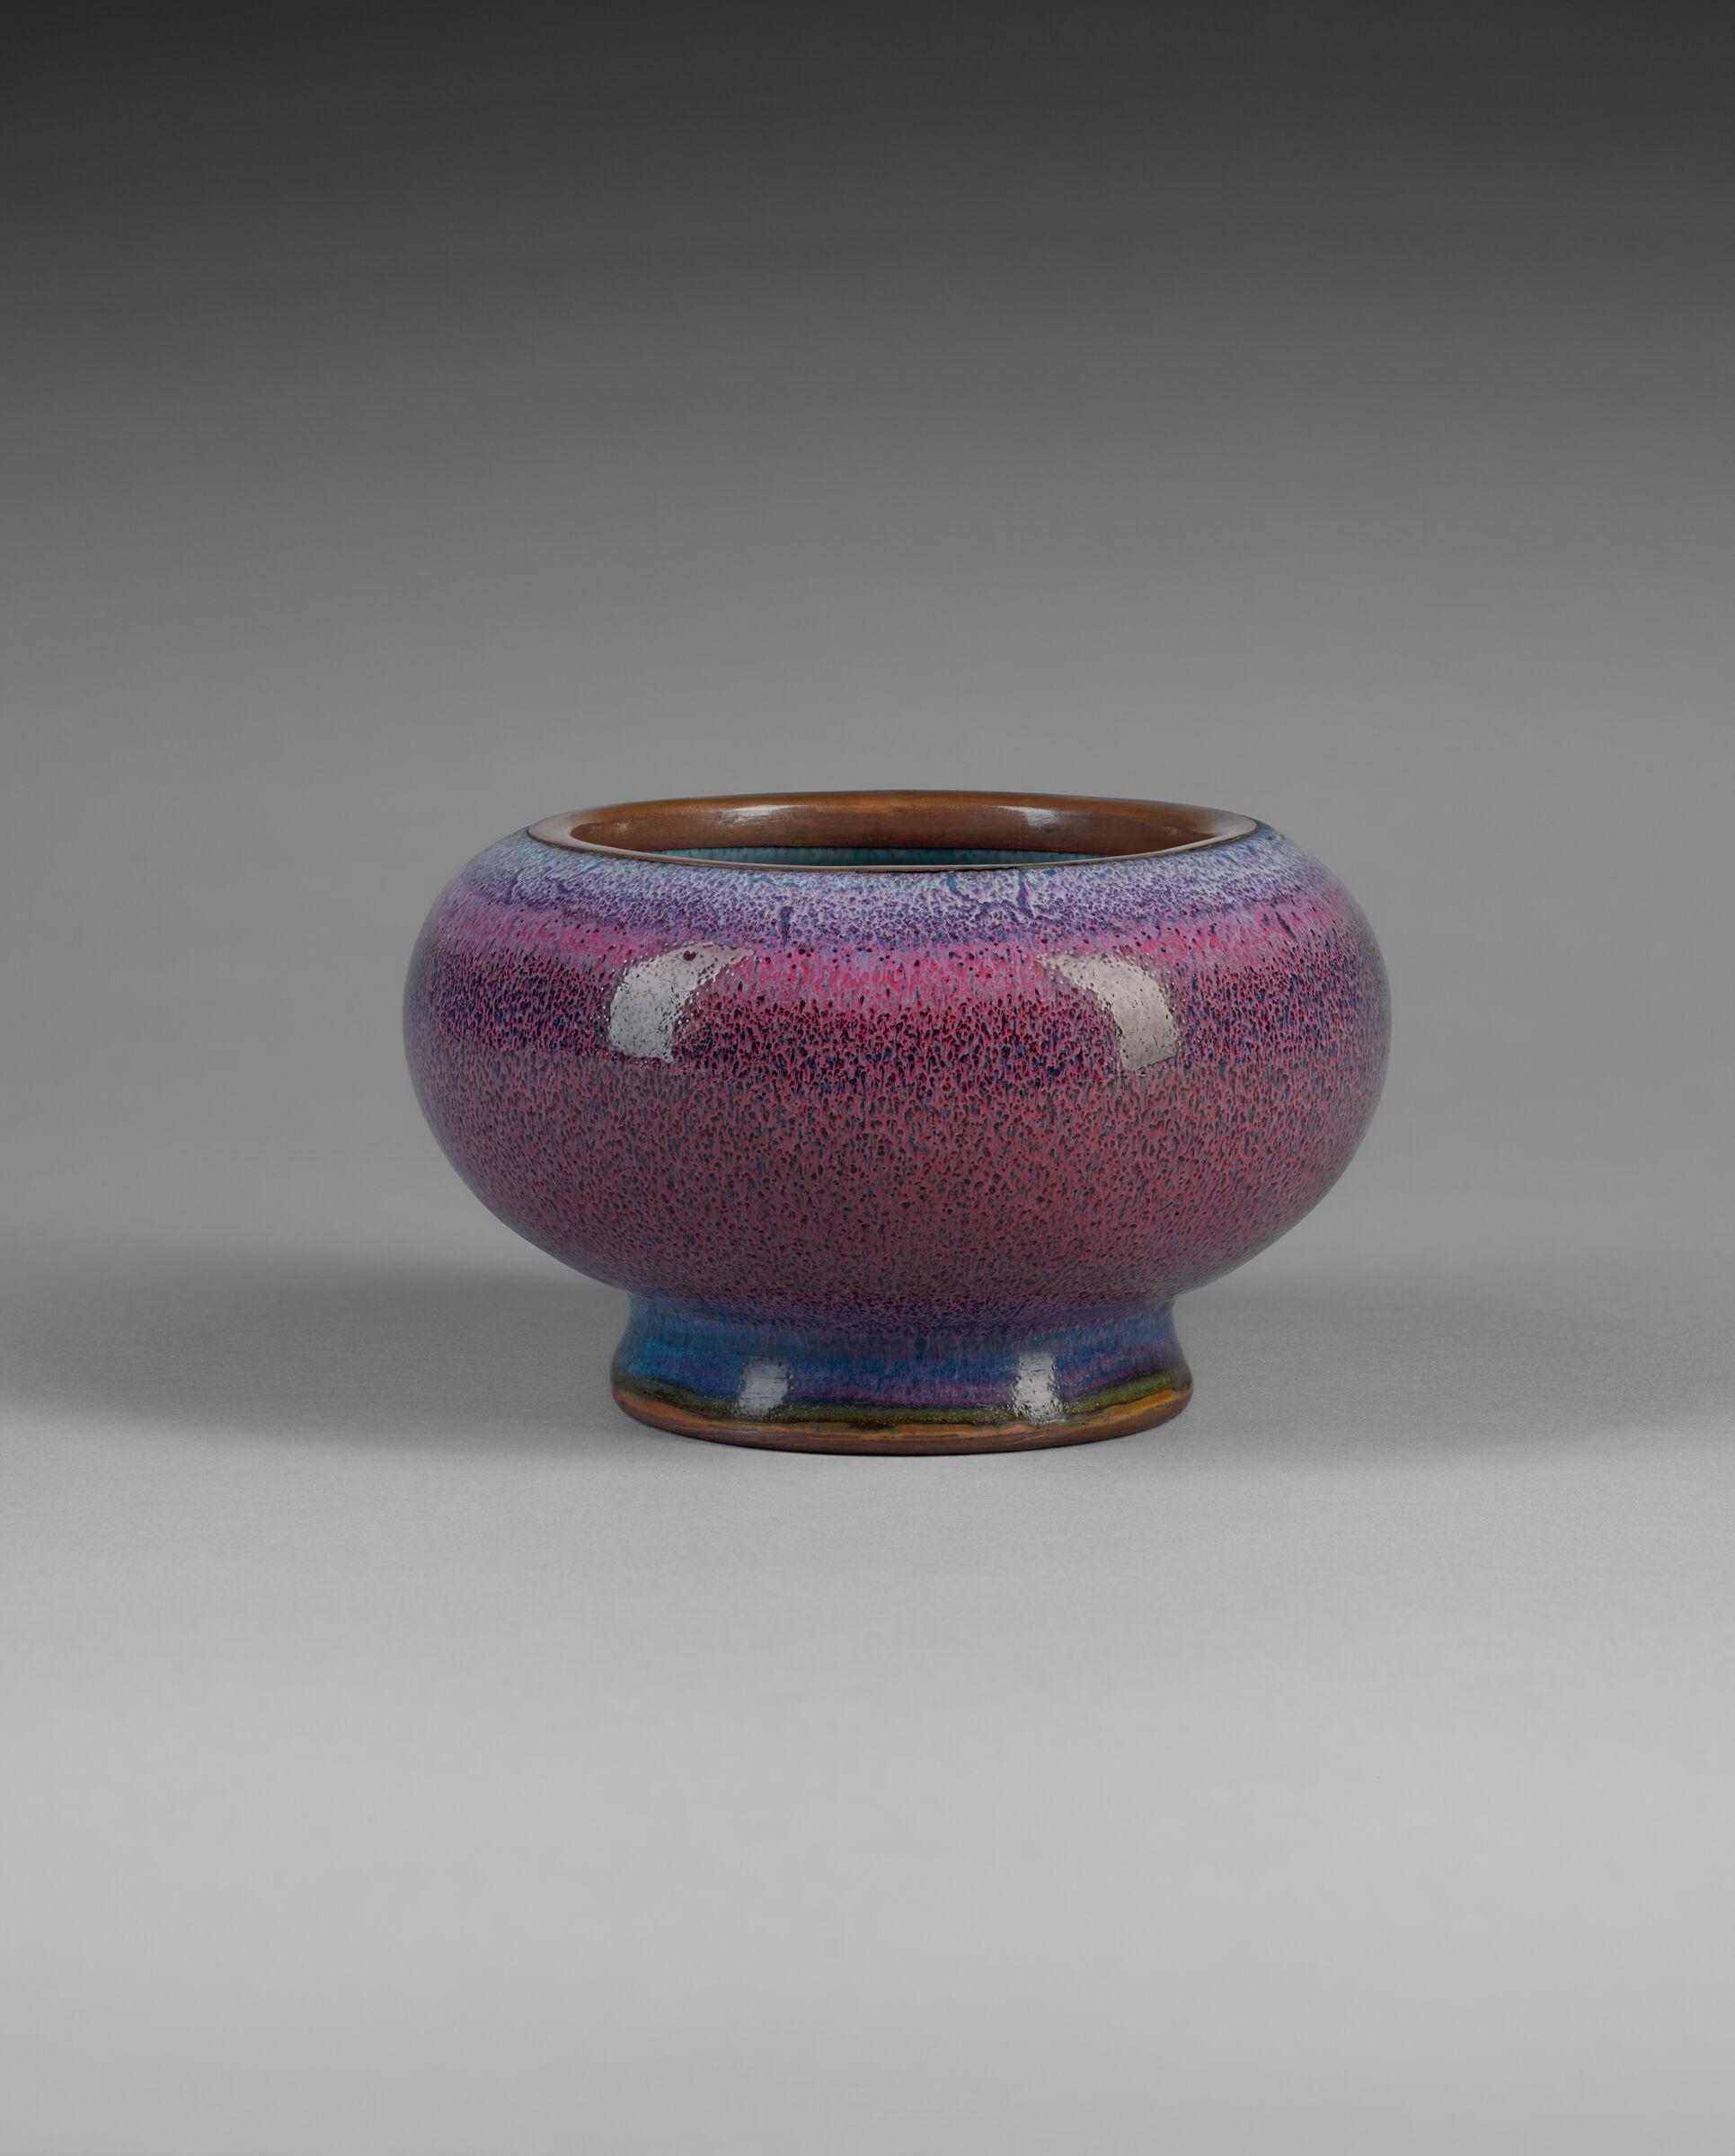 Perfumer Or Incense Burner Cut Down From A Zhadou-Shaped Flowerpot